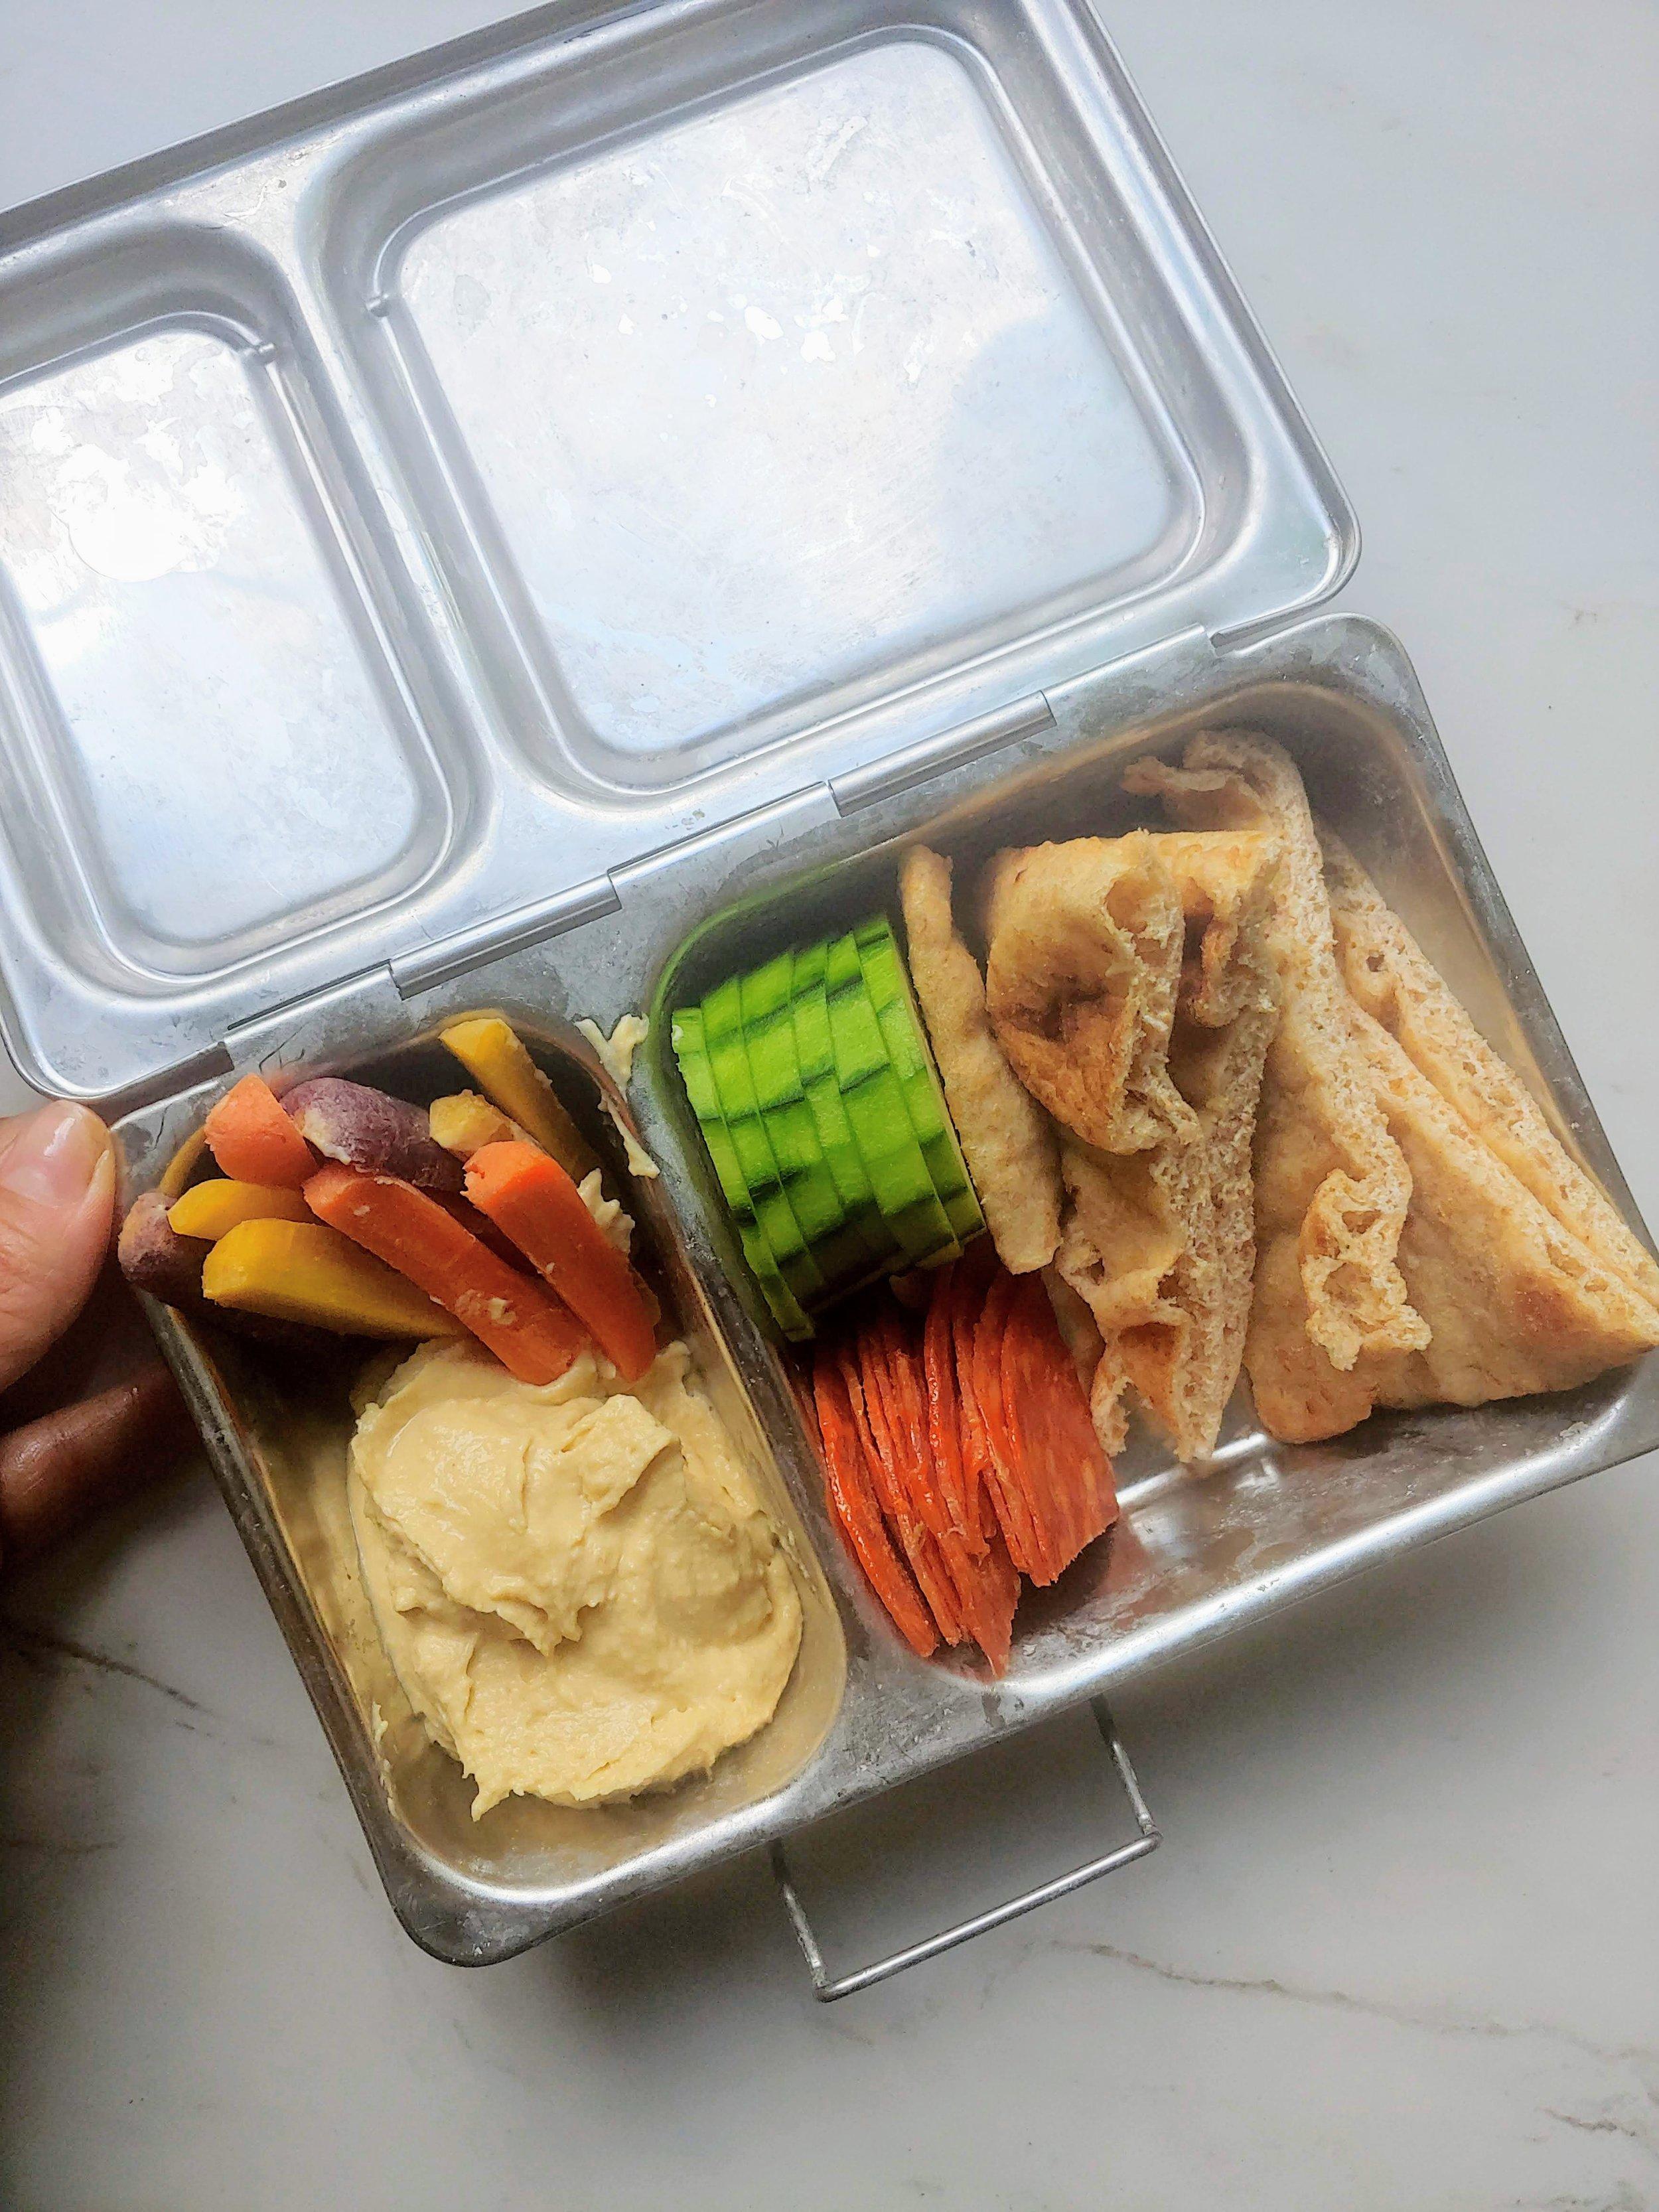 healthy lunchobox ideas